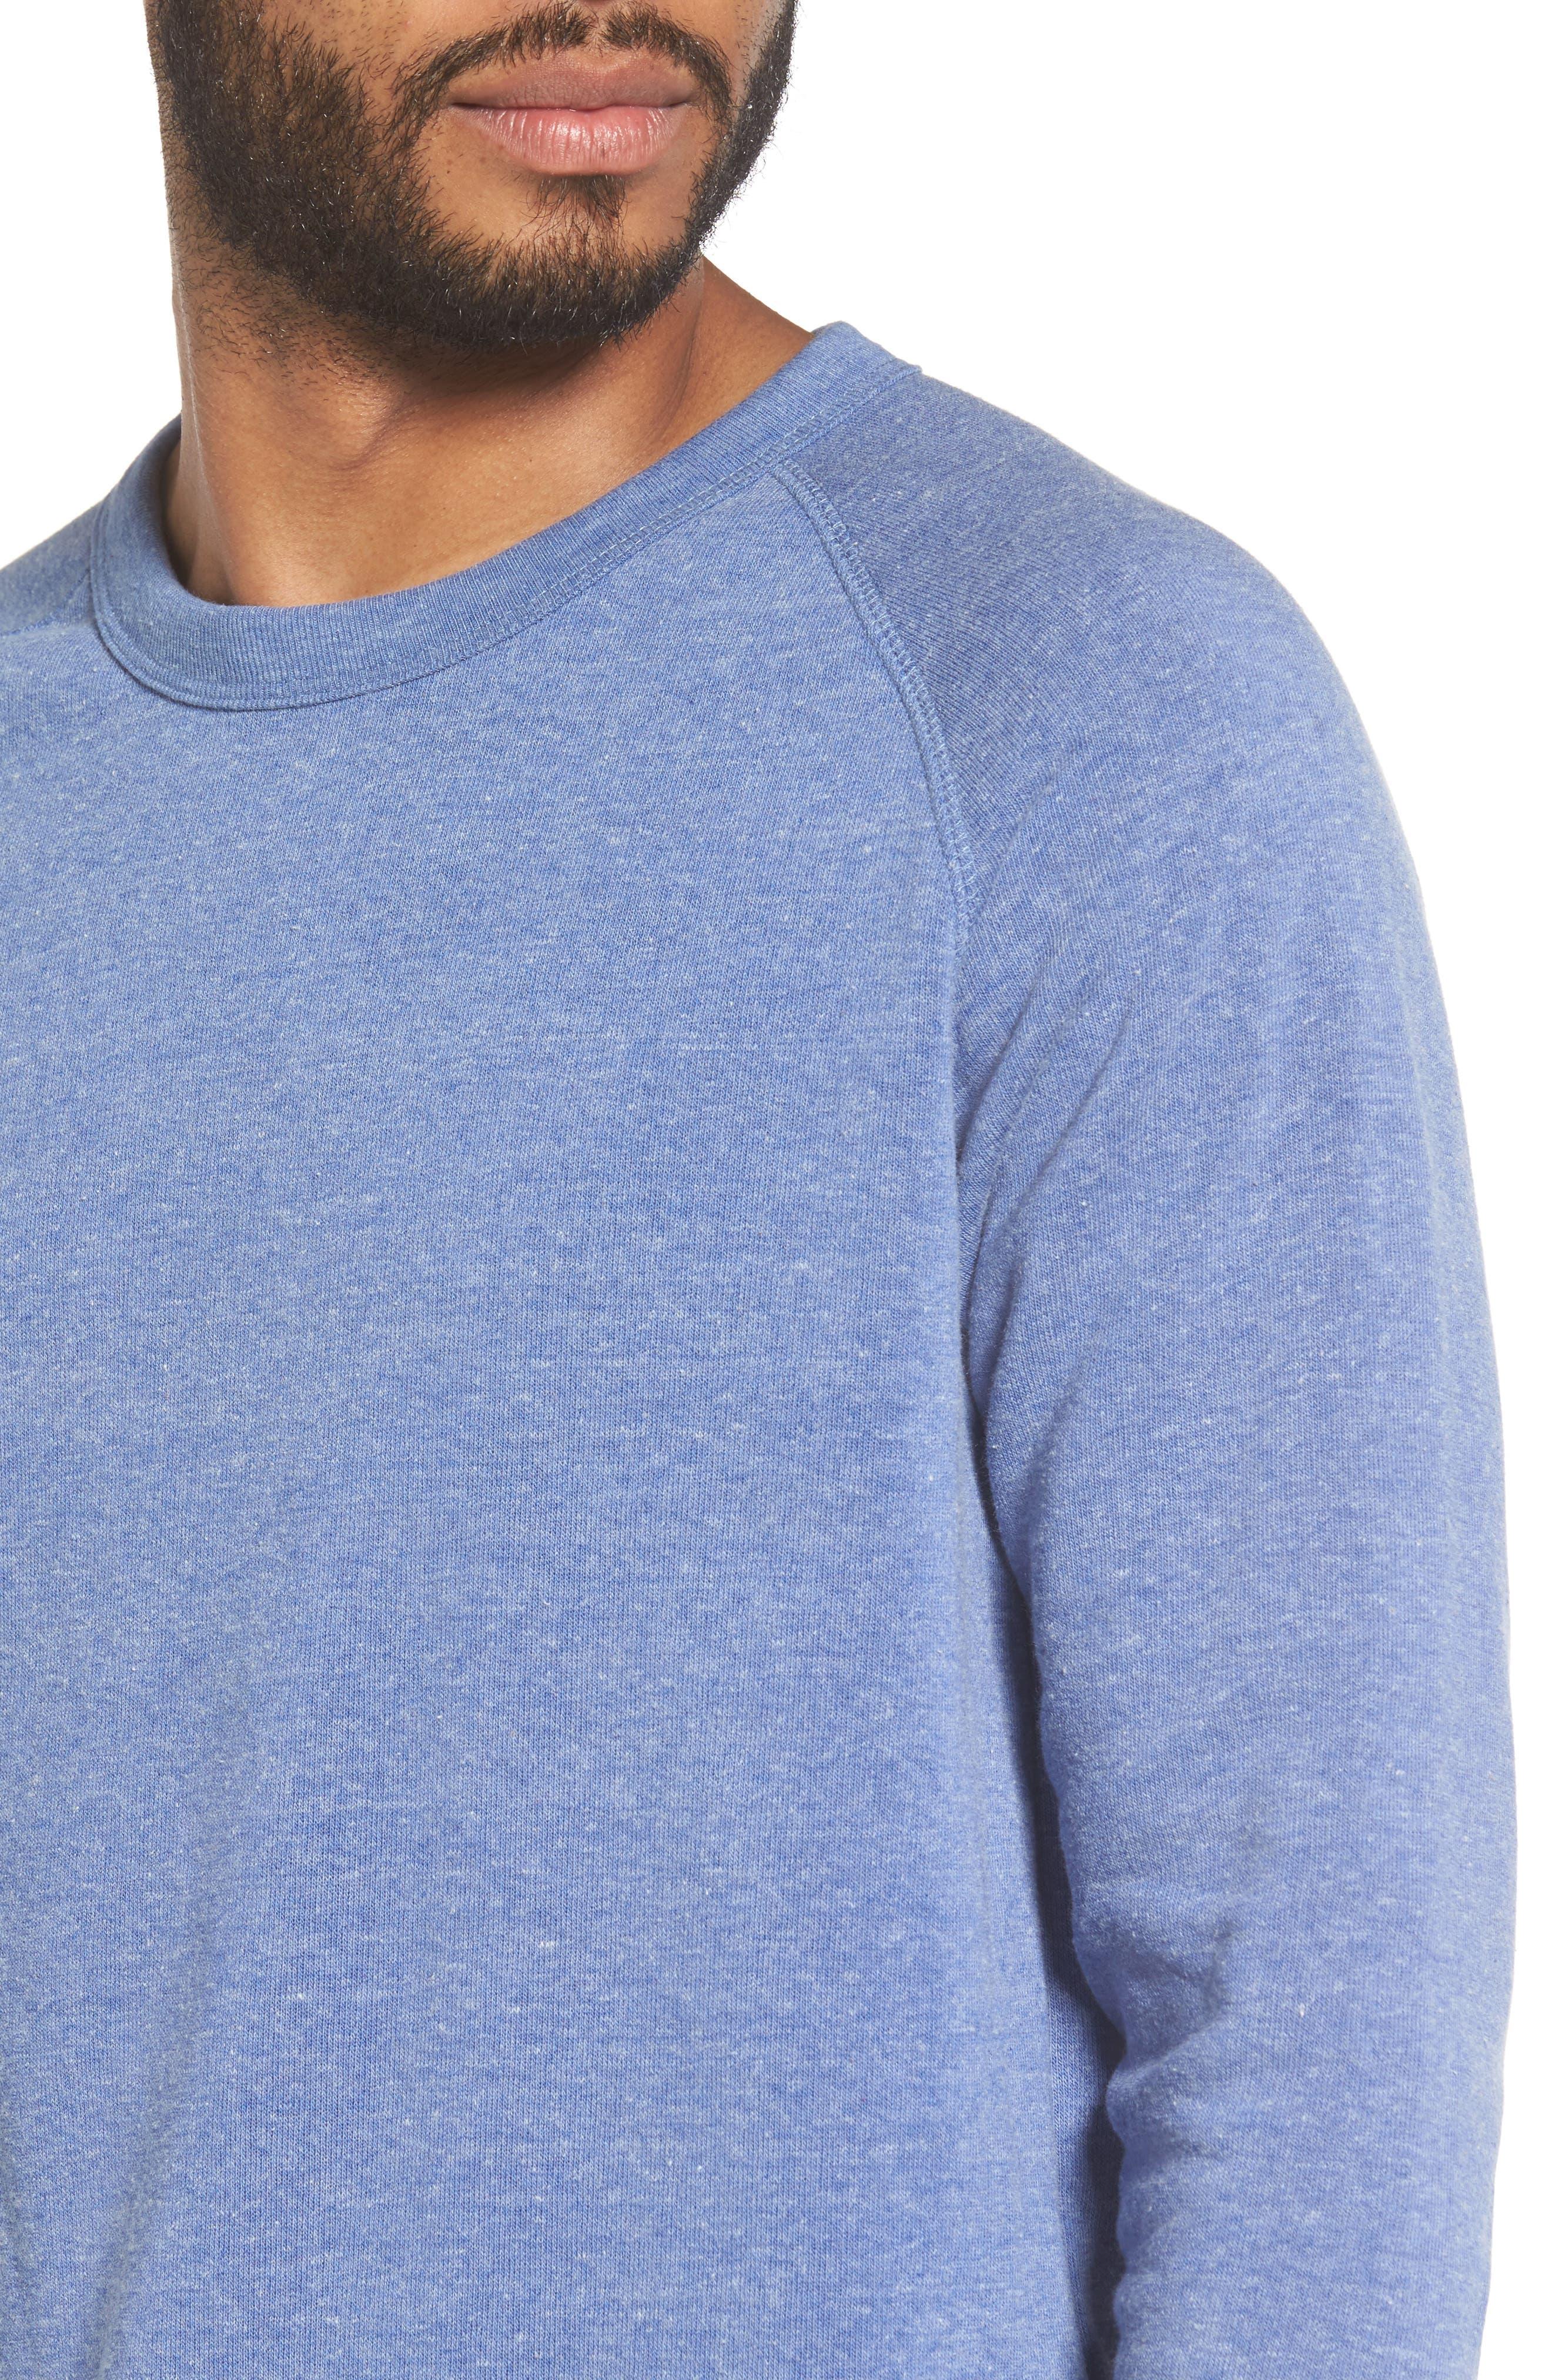 'The Champ' Sweatshirt,                             Alternate thumbnail 44, color,